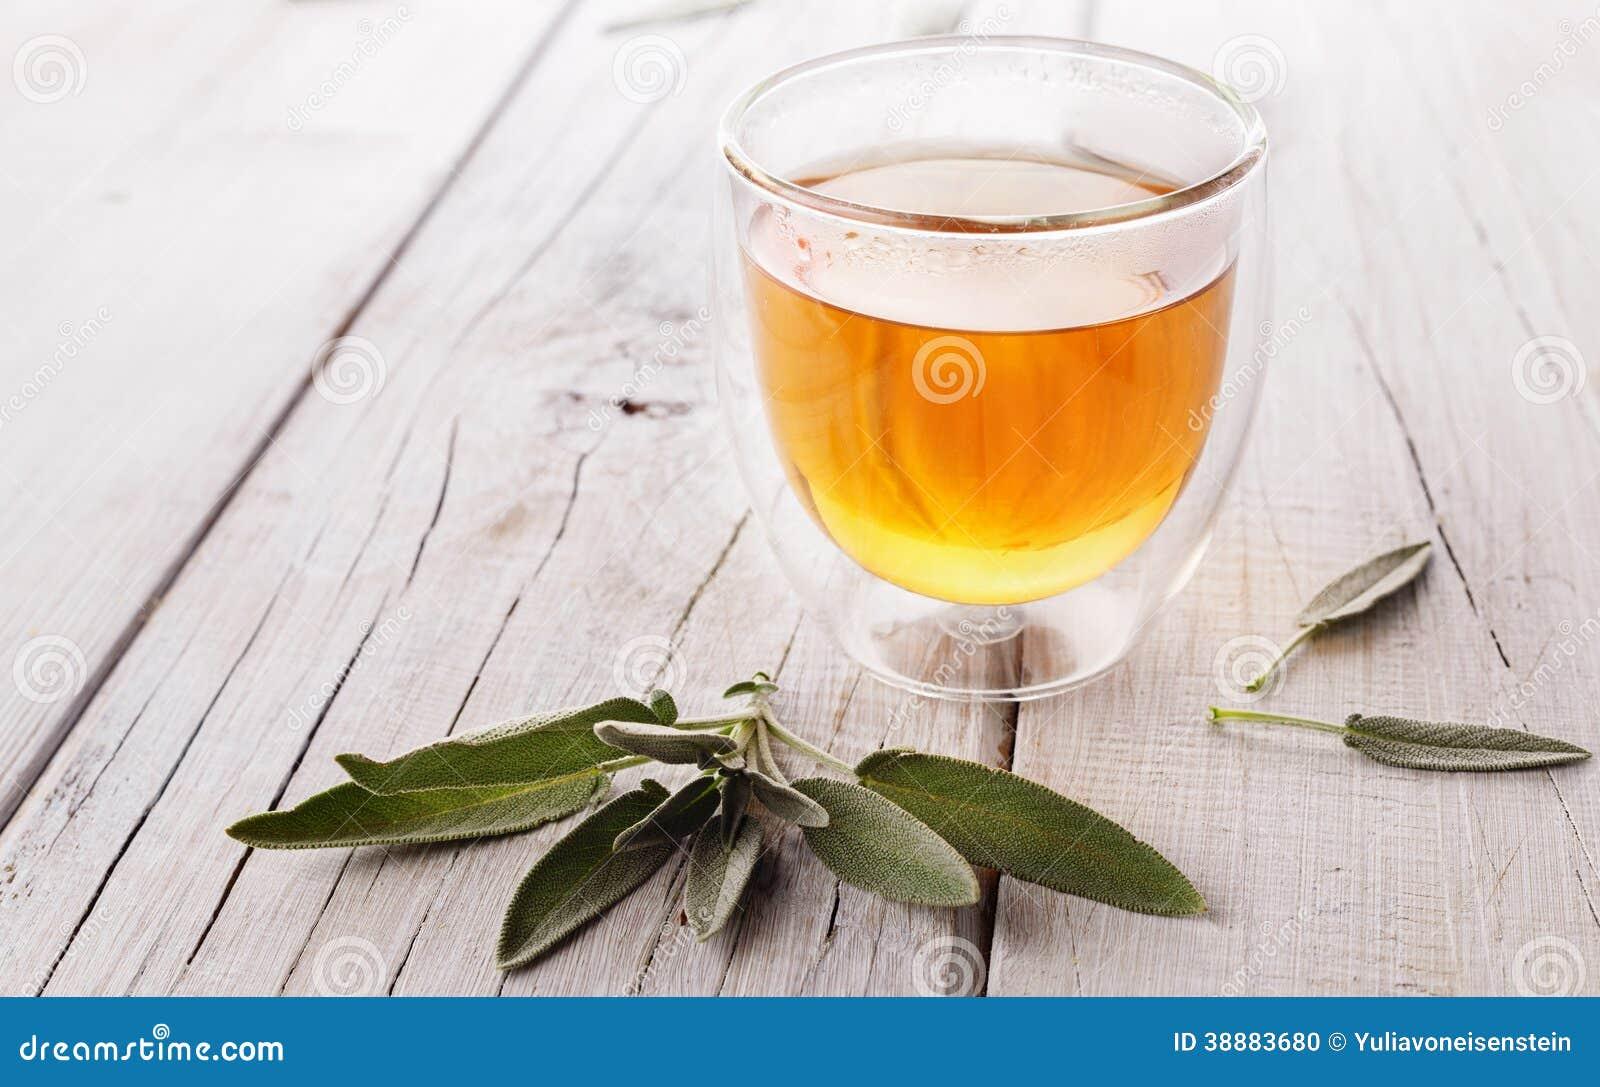 Herbal sage tea on wooden background